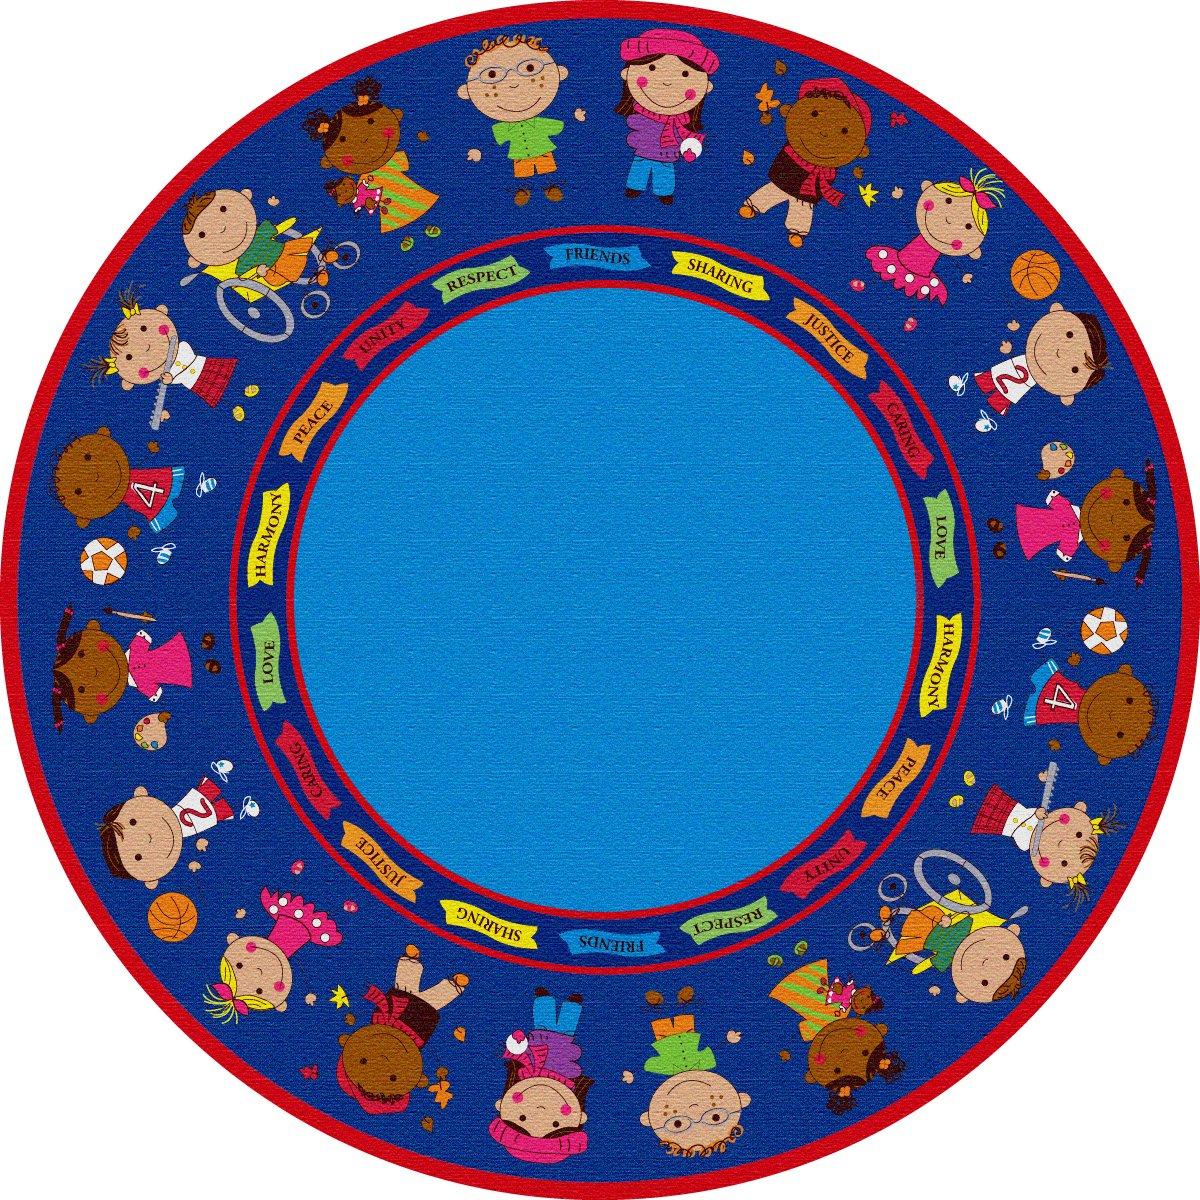 Kid Carpet FE82027A Friends Full Circle Round Nylon Area Rug, 6' , Multicolored